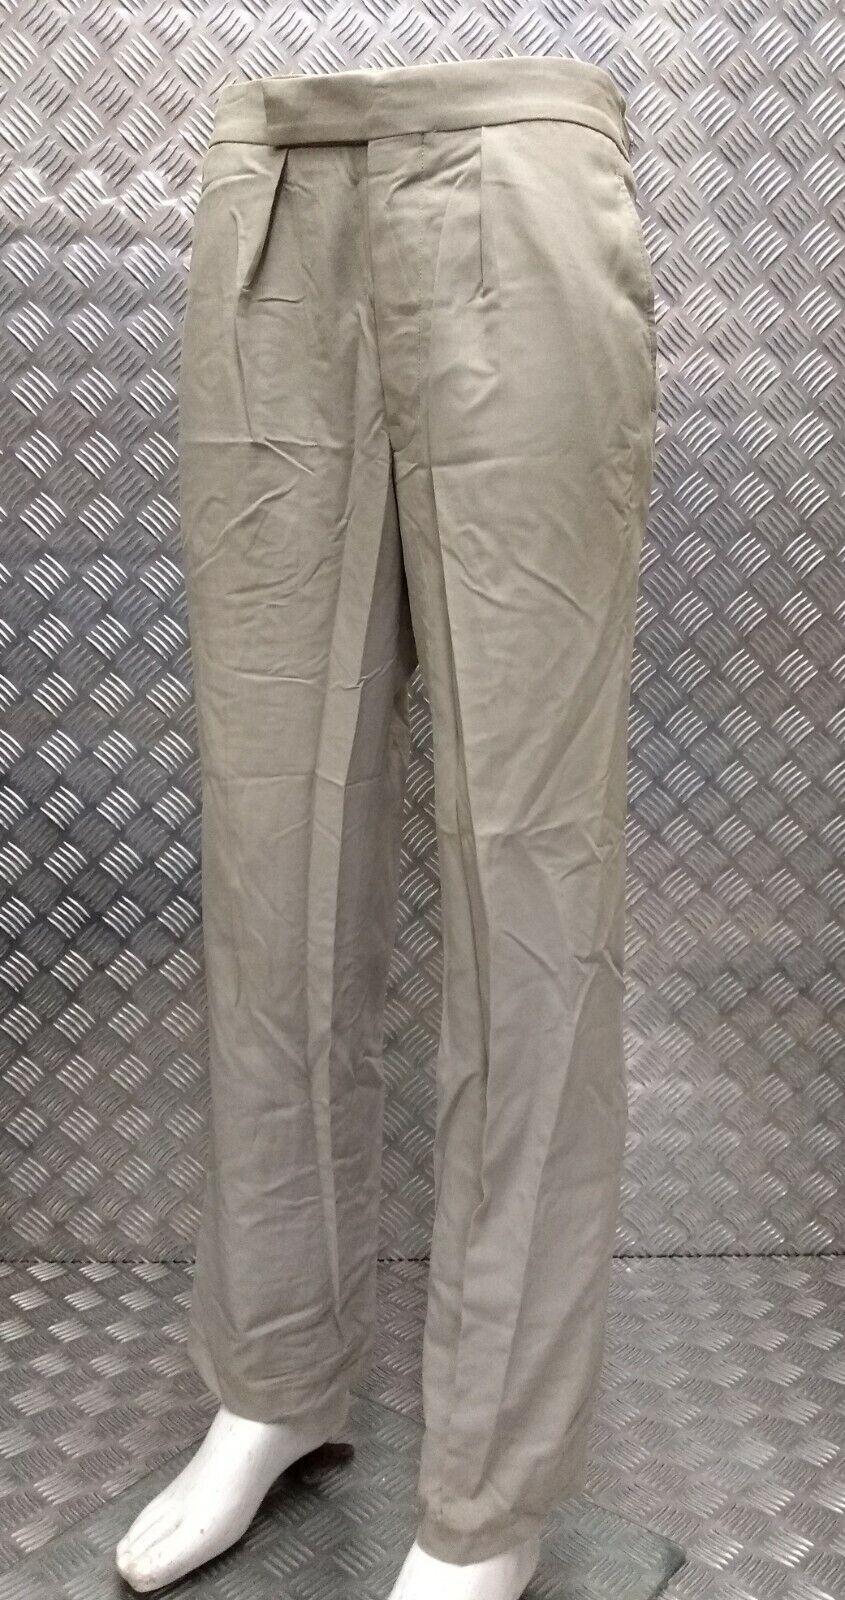 No6 Army Trousers Number Six Uniform Dress Stone / Safari British Issue EBYT501